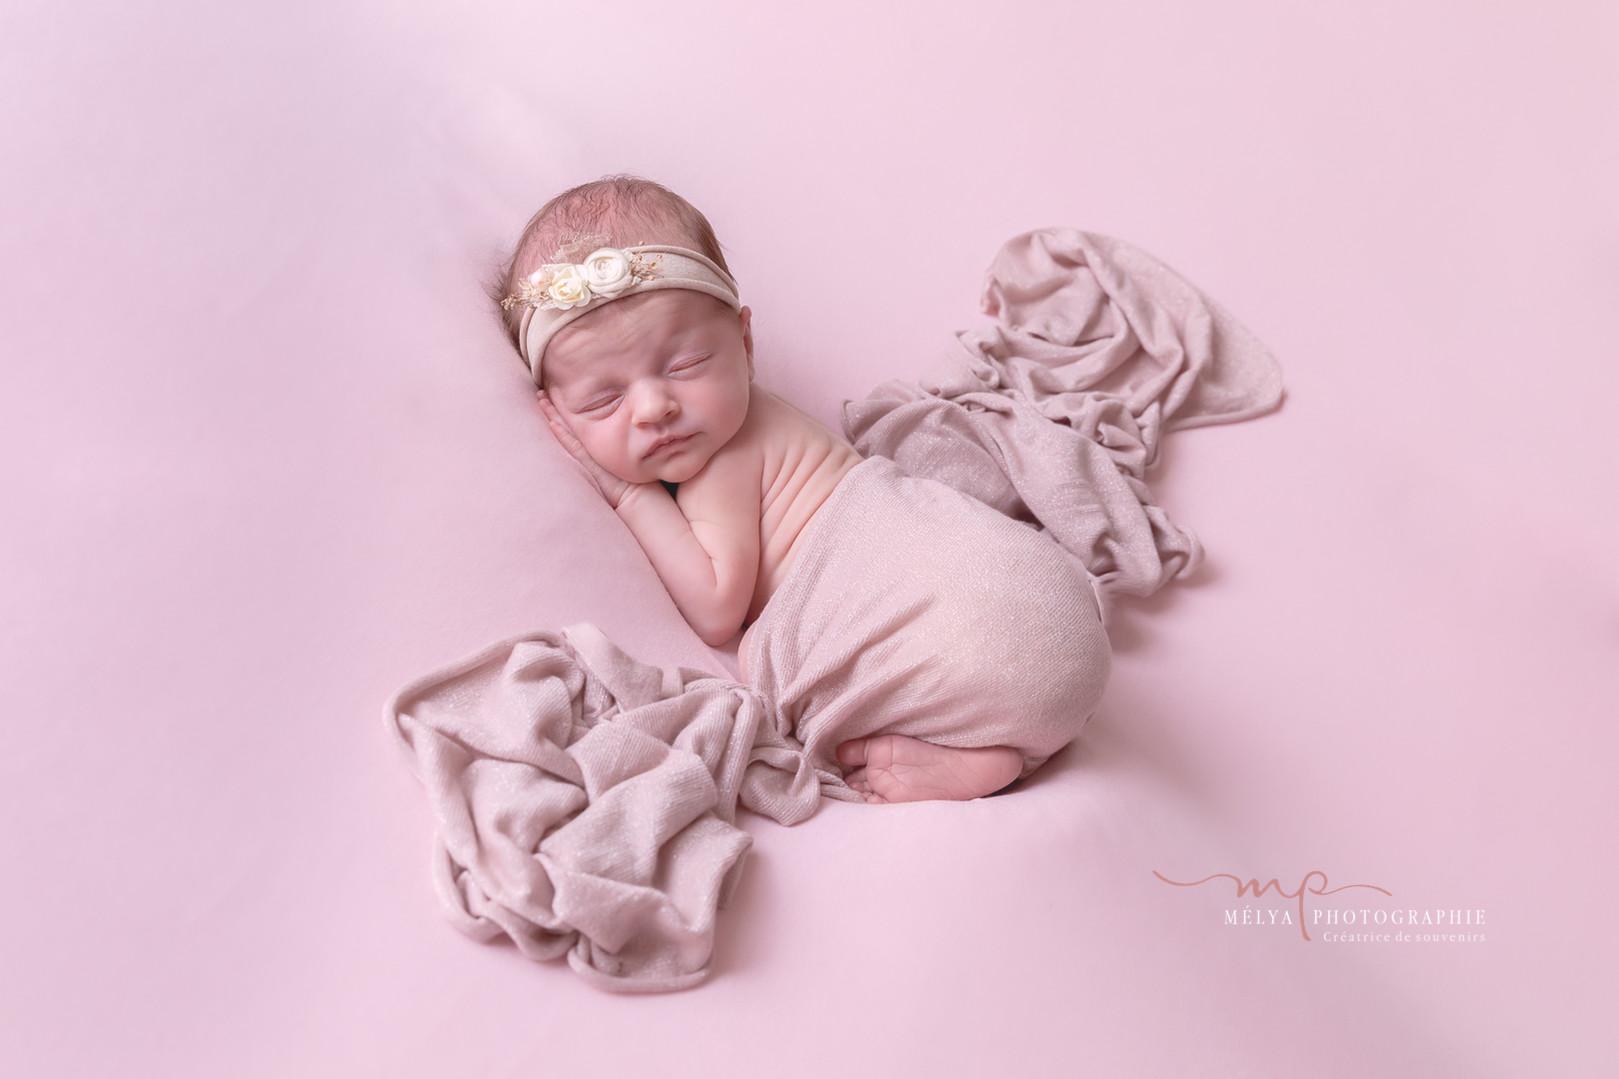 séance photo naissance melya photographie